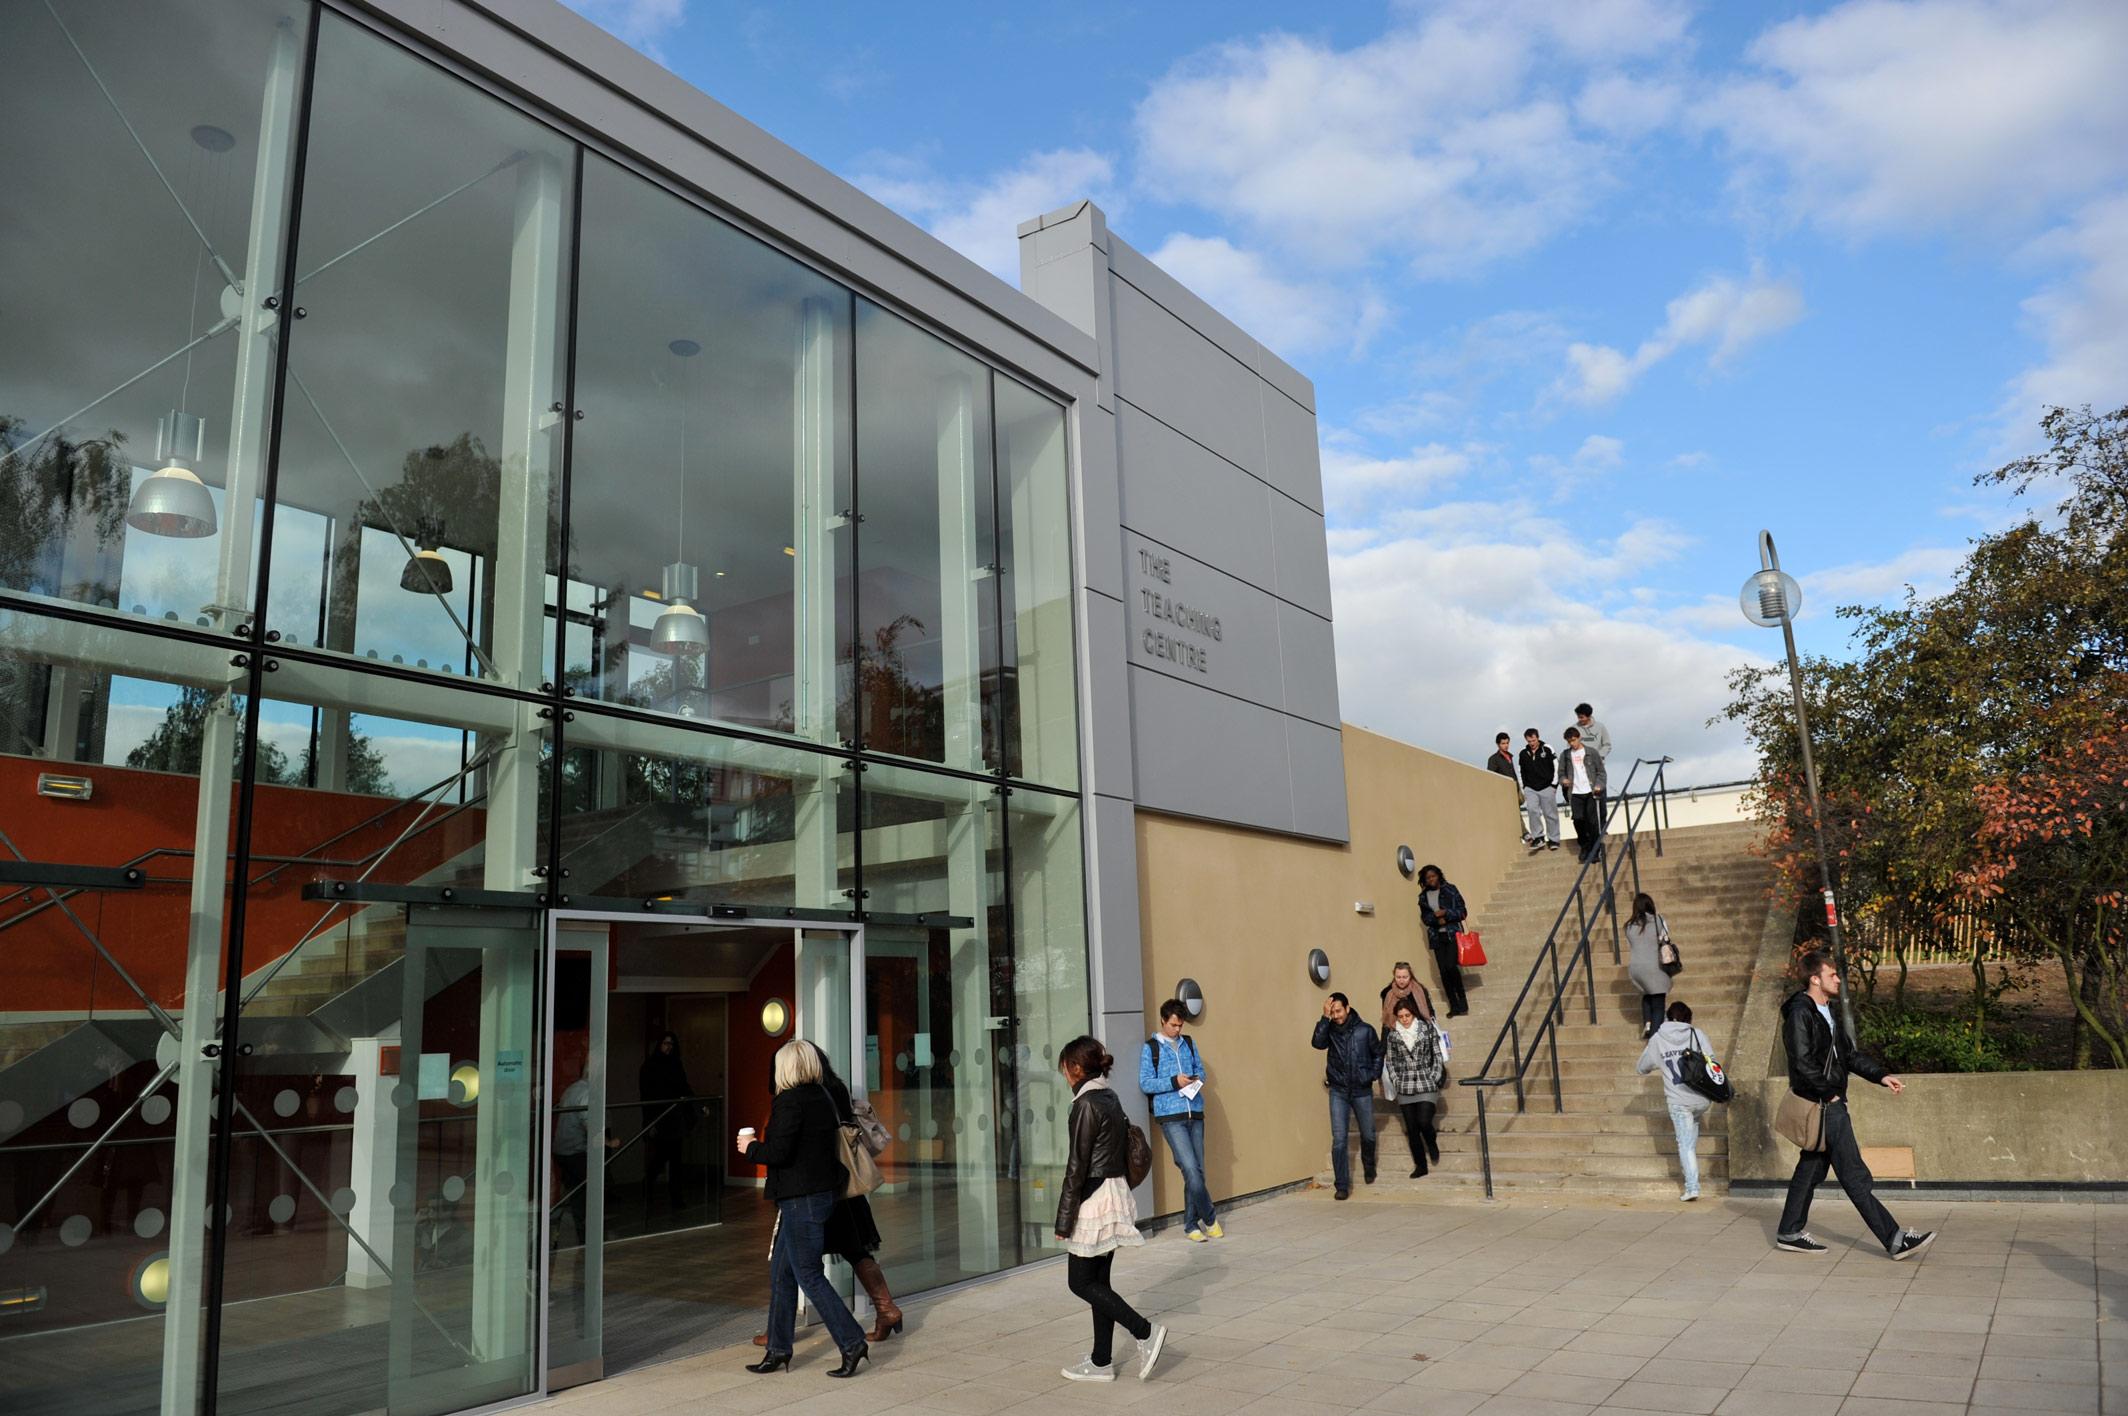 The-University-of-Essex-campus-ingiltere-lisans-okul-3.jpg